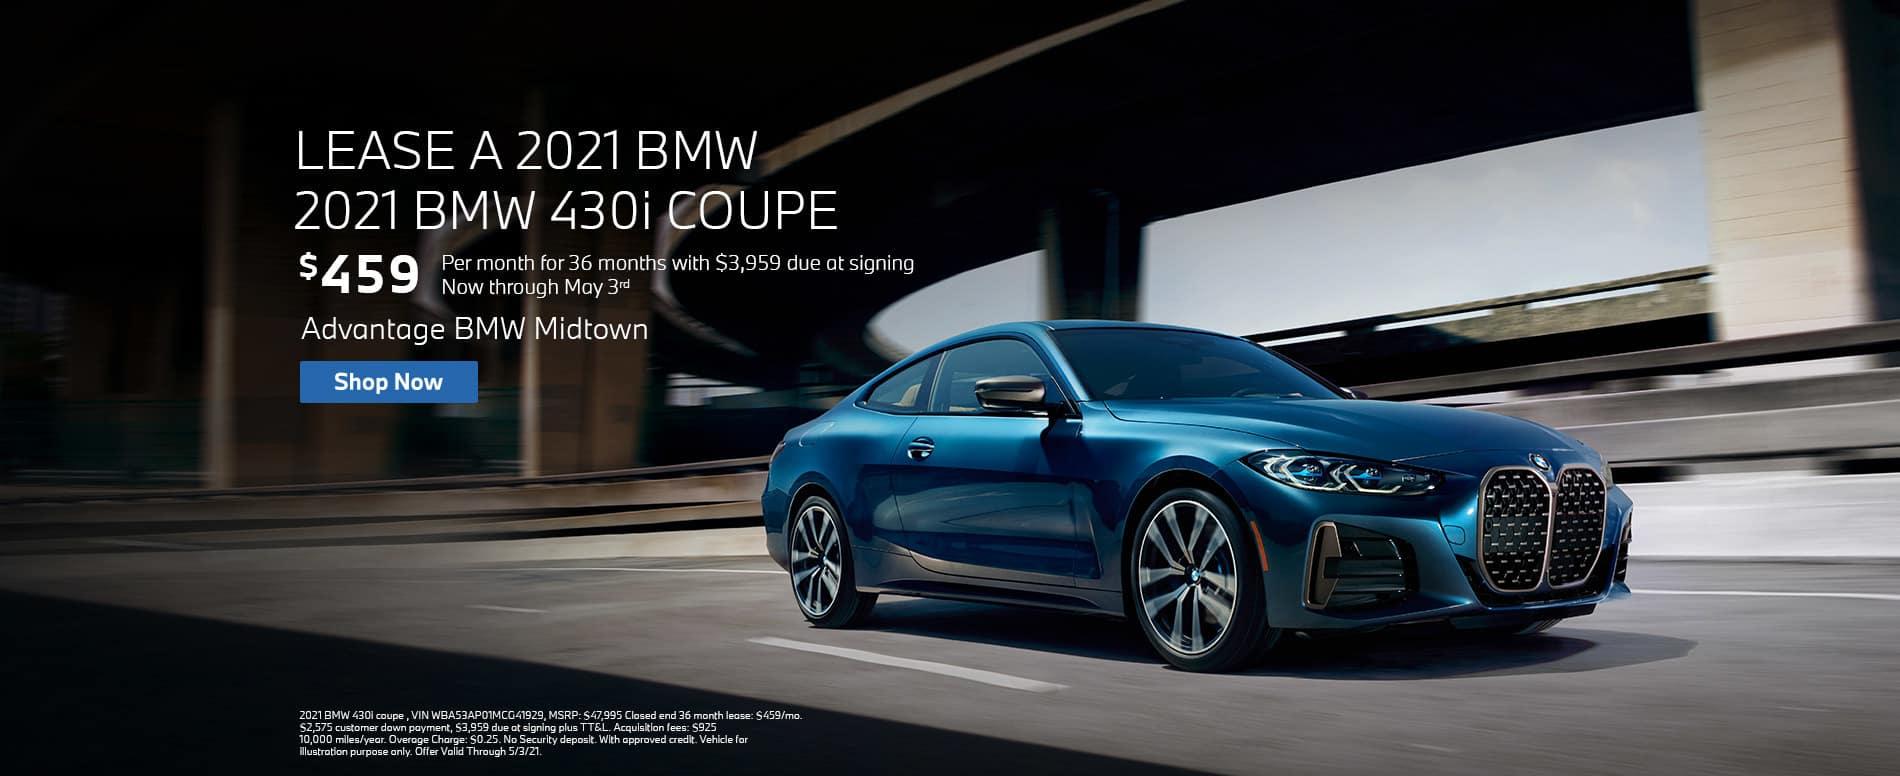 21APR_BMWM_430i_WB_1900x776-1